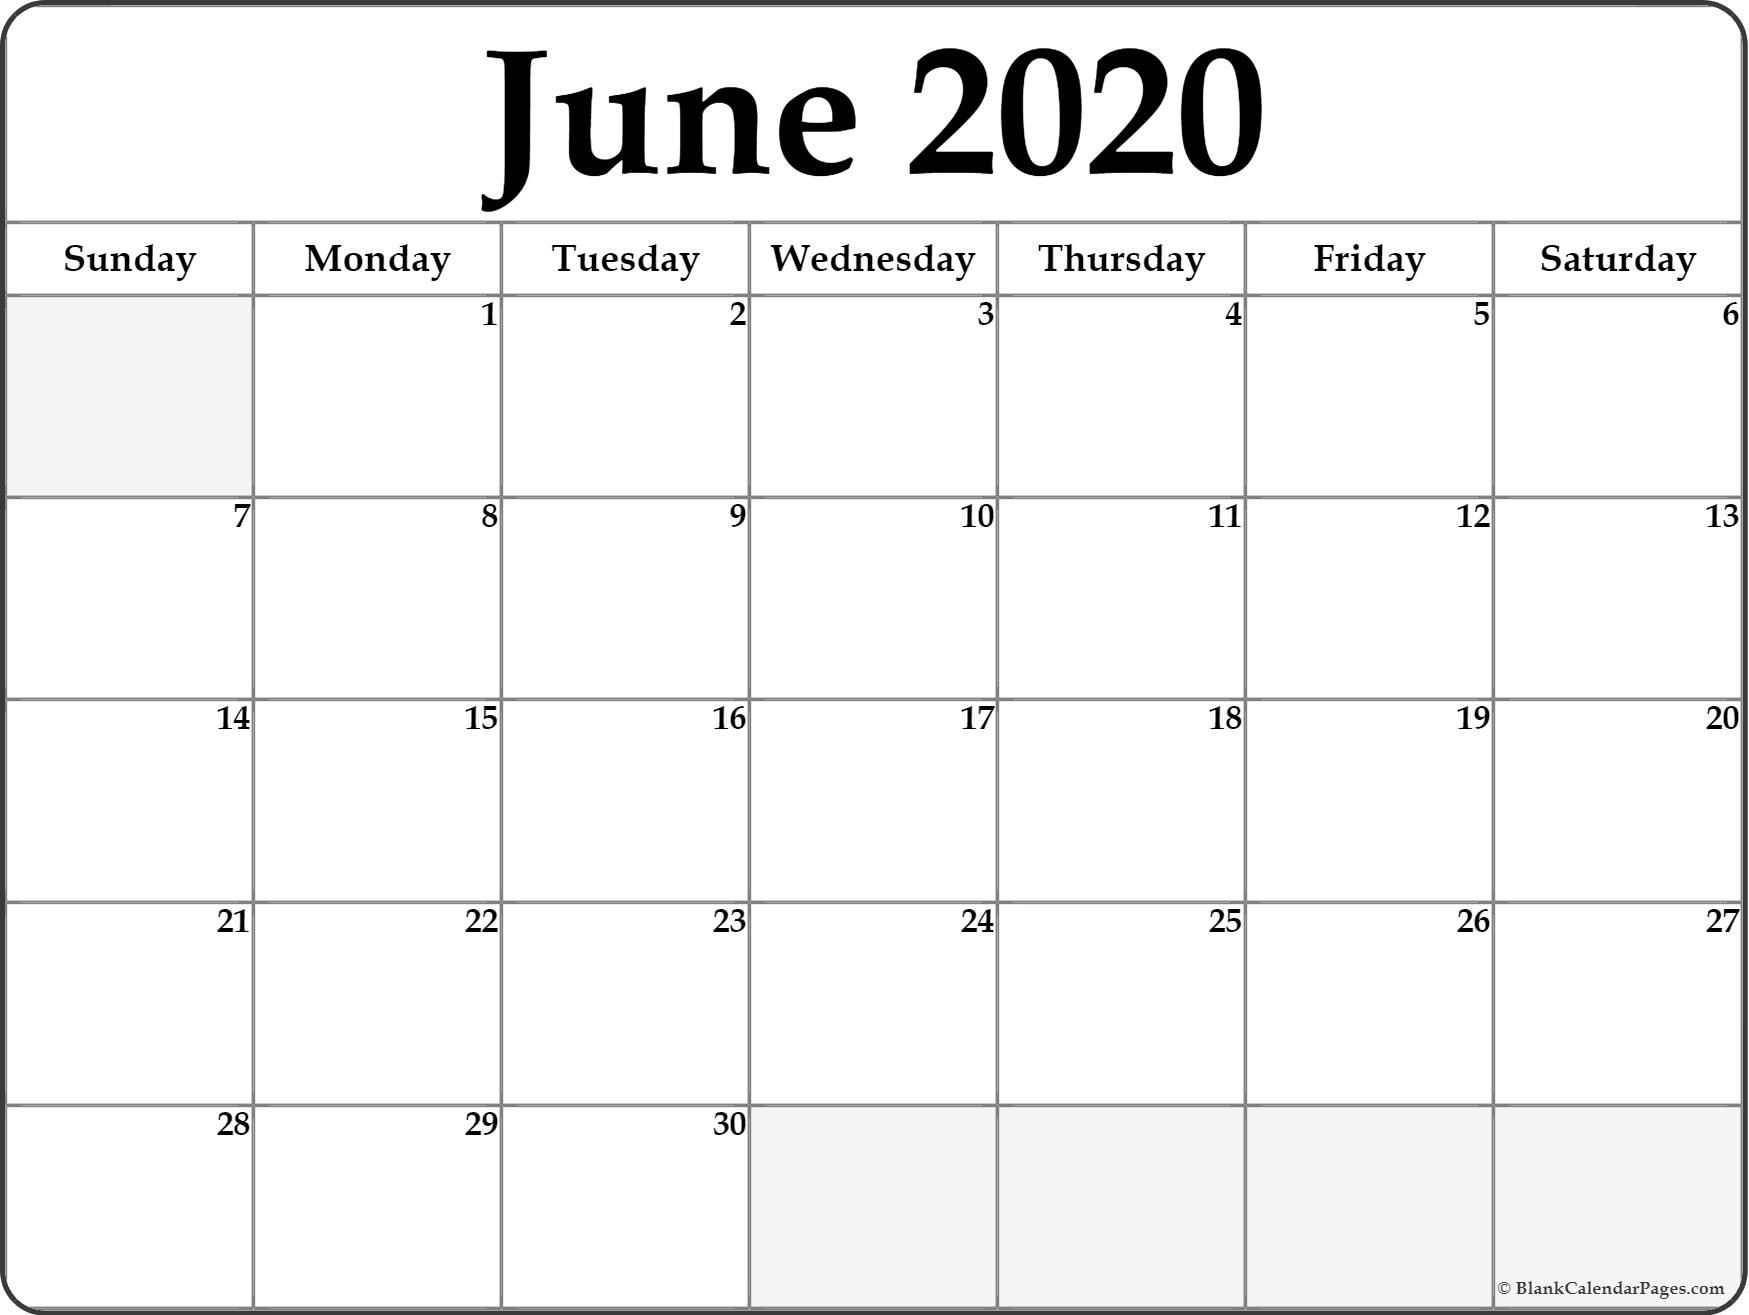 2020 Calender With Space To Write - Calendar Inspiration Design